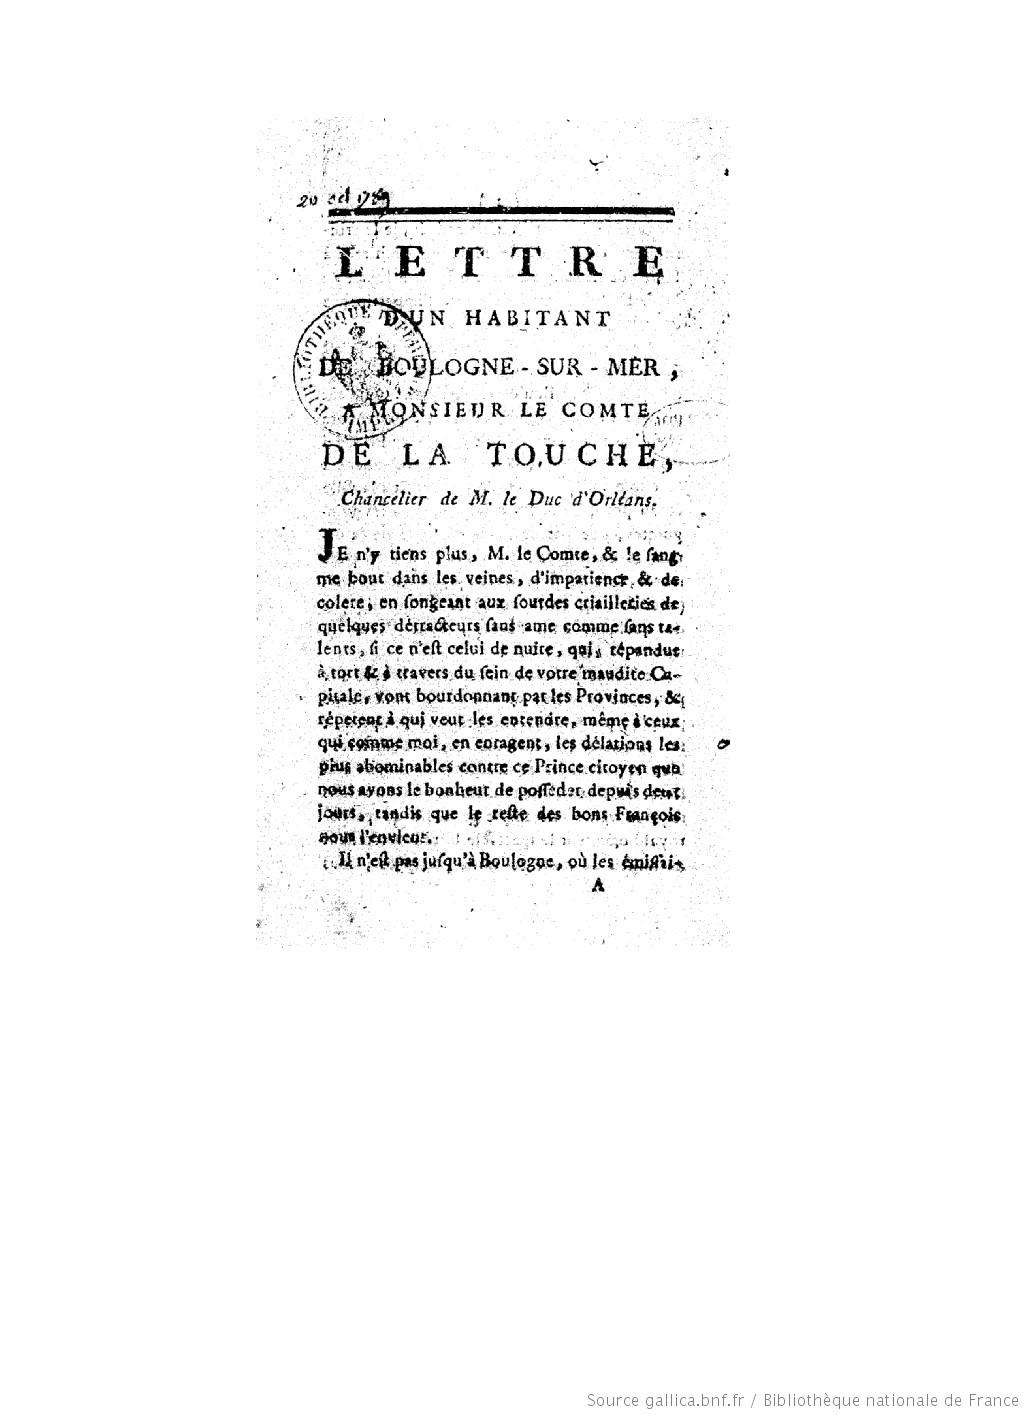 http://gallica.bnf.fr/ark:/12148/bpt6k40528j.thumbnail.highres.jpg